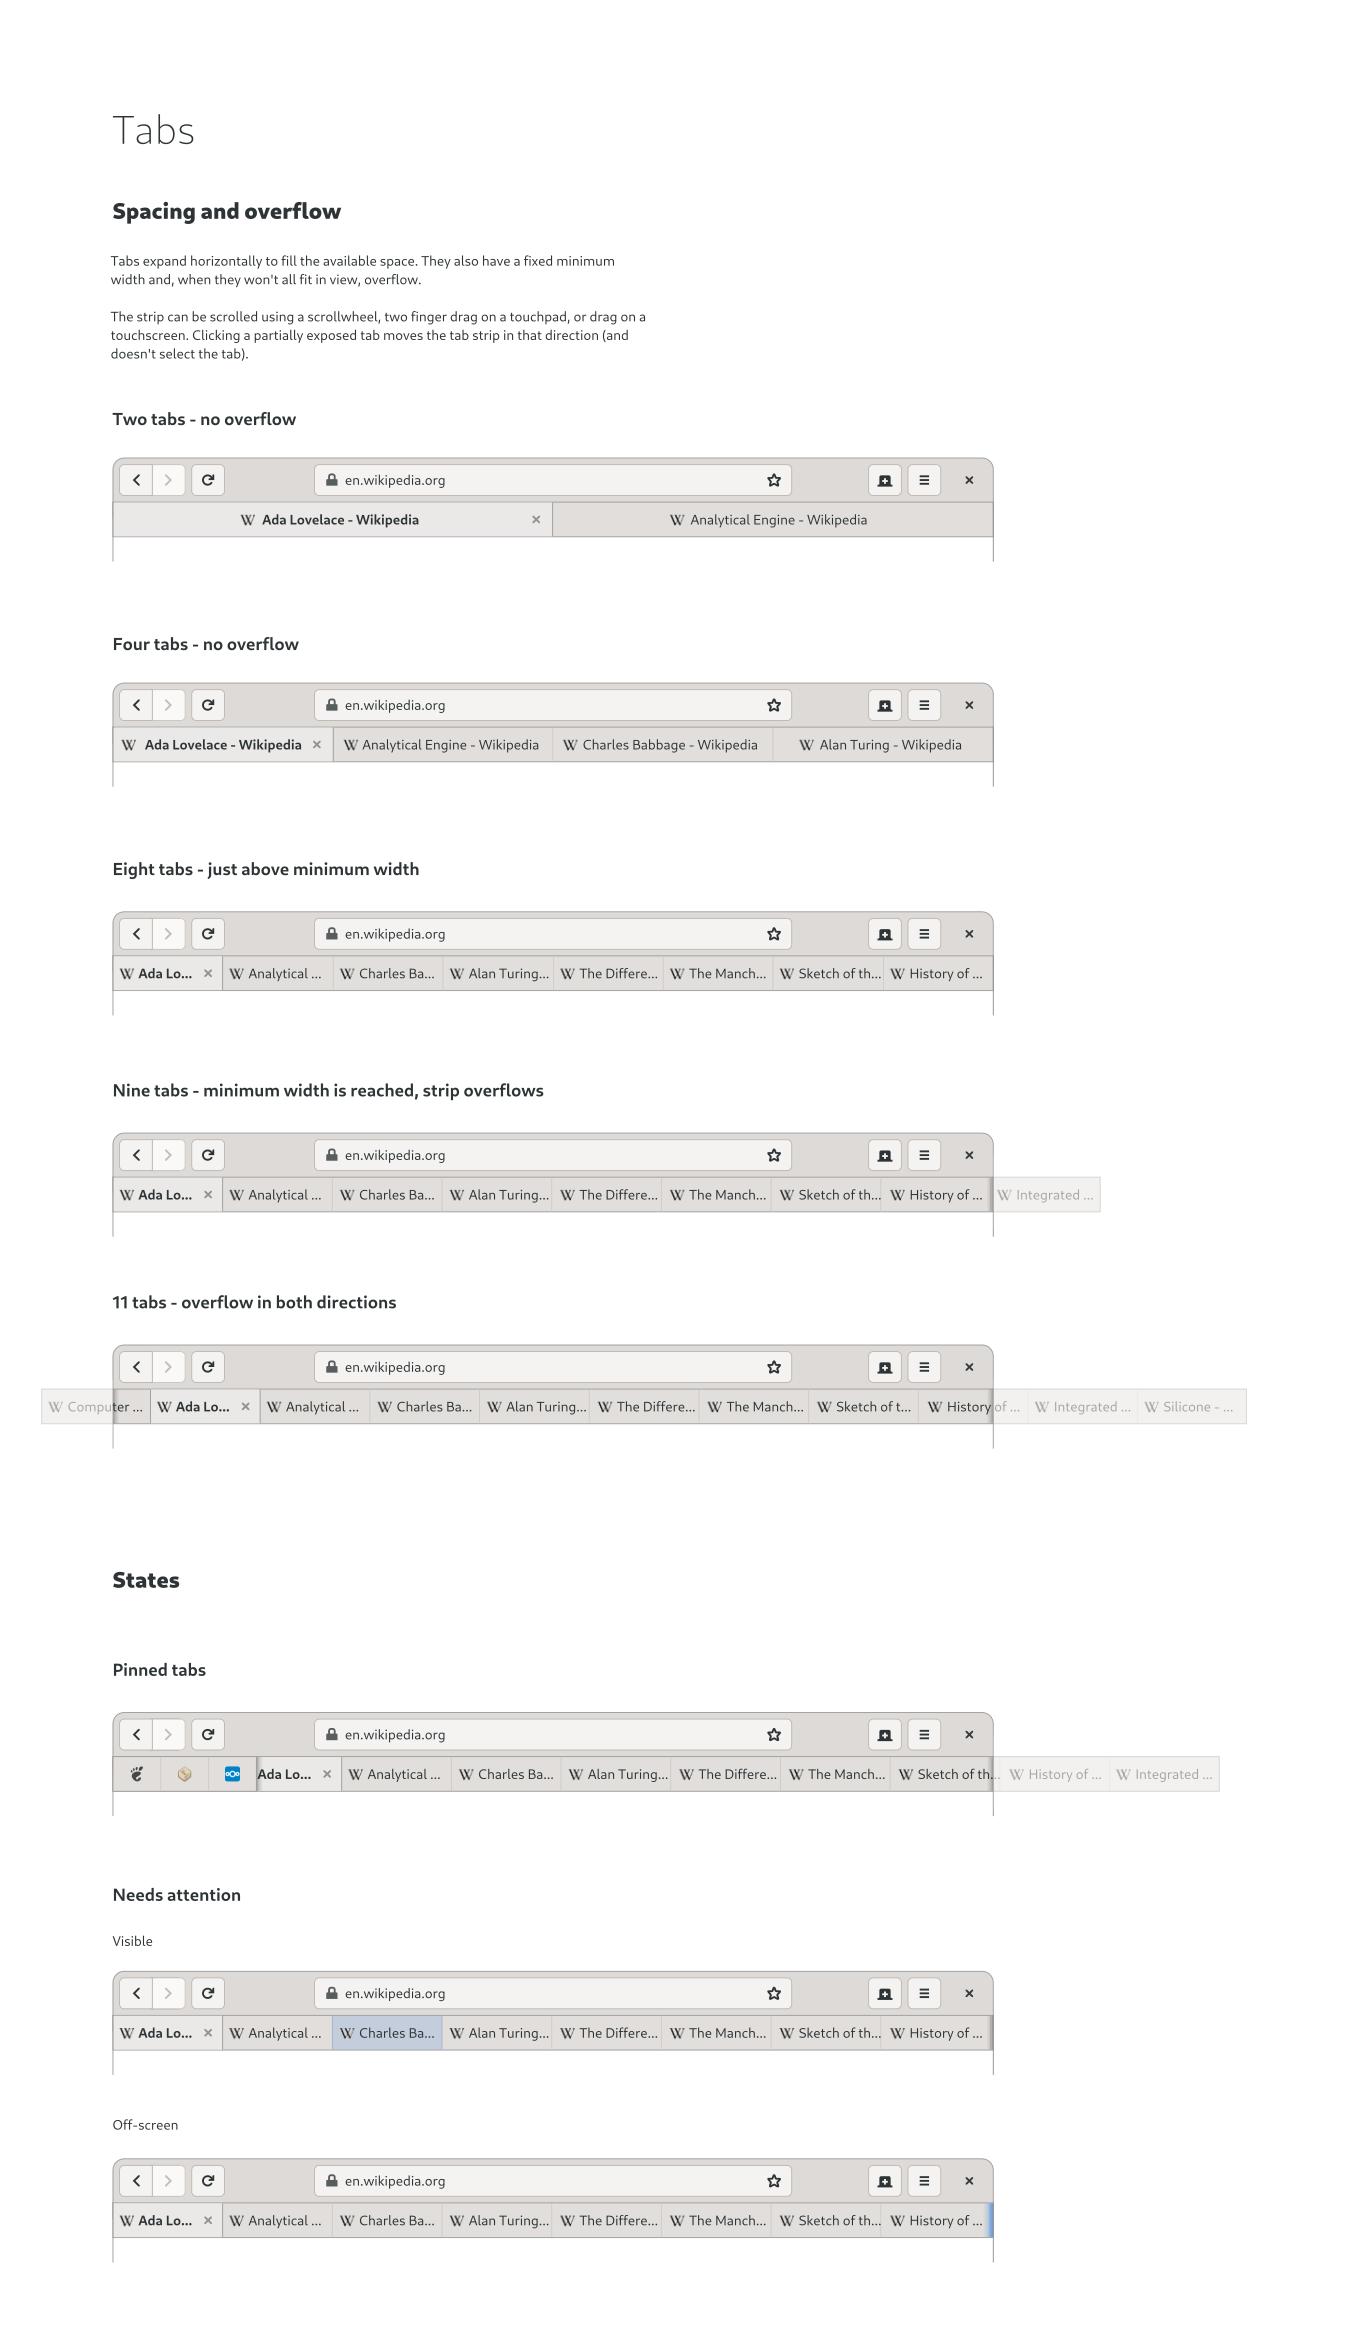 https://gitlab.gnome.org/Teams/Design/os-mockups/-/raw/master/tabs/tabs.png?inline=false